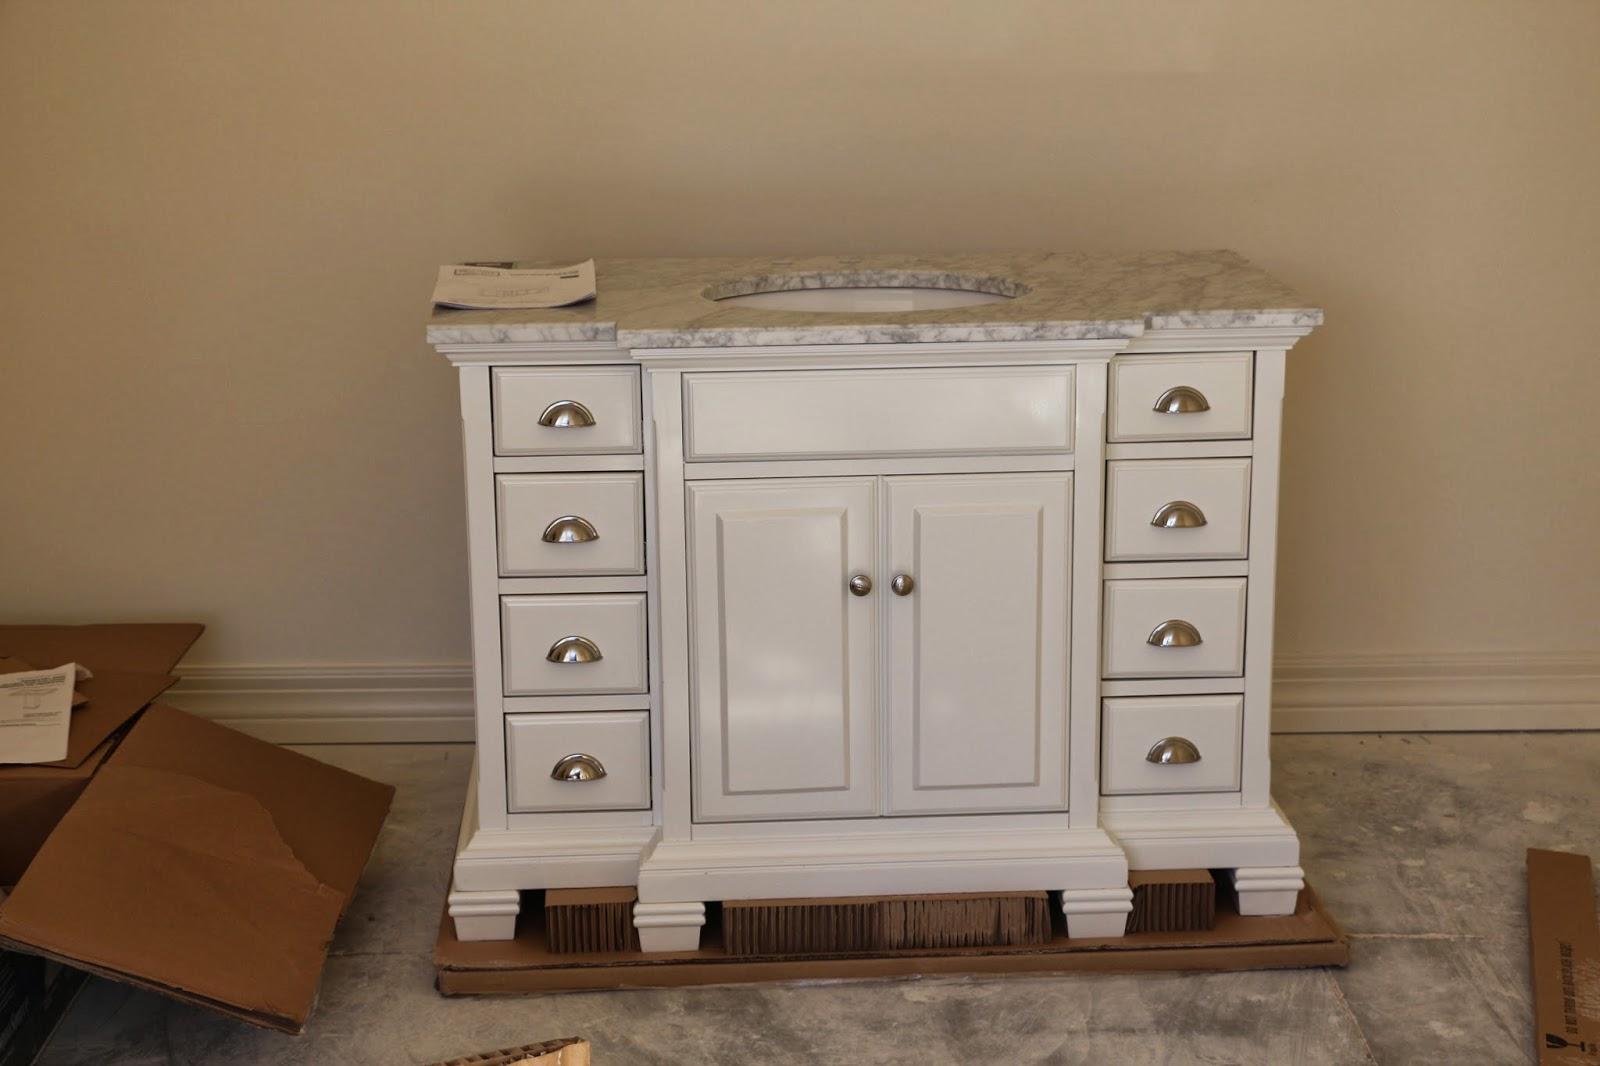 Allen + Roth Vanover vanity, white and marble vanity